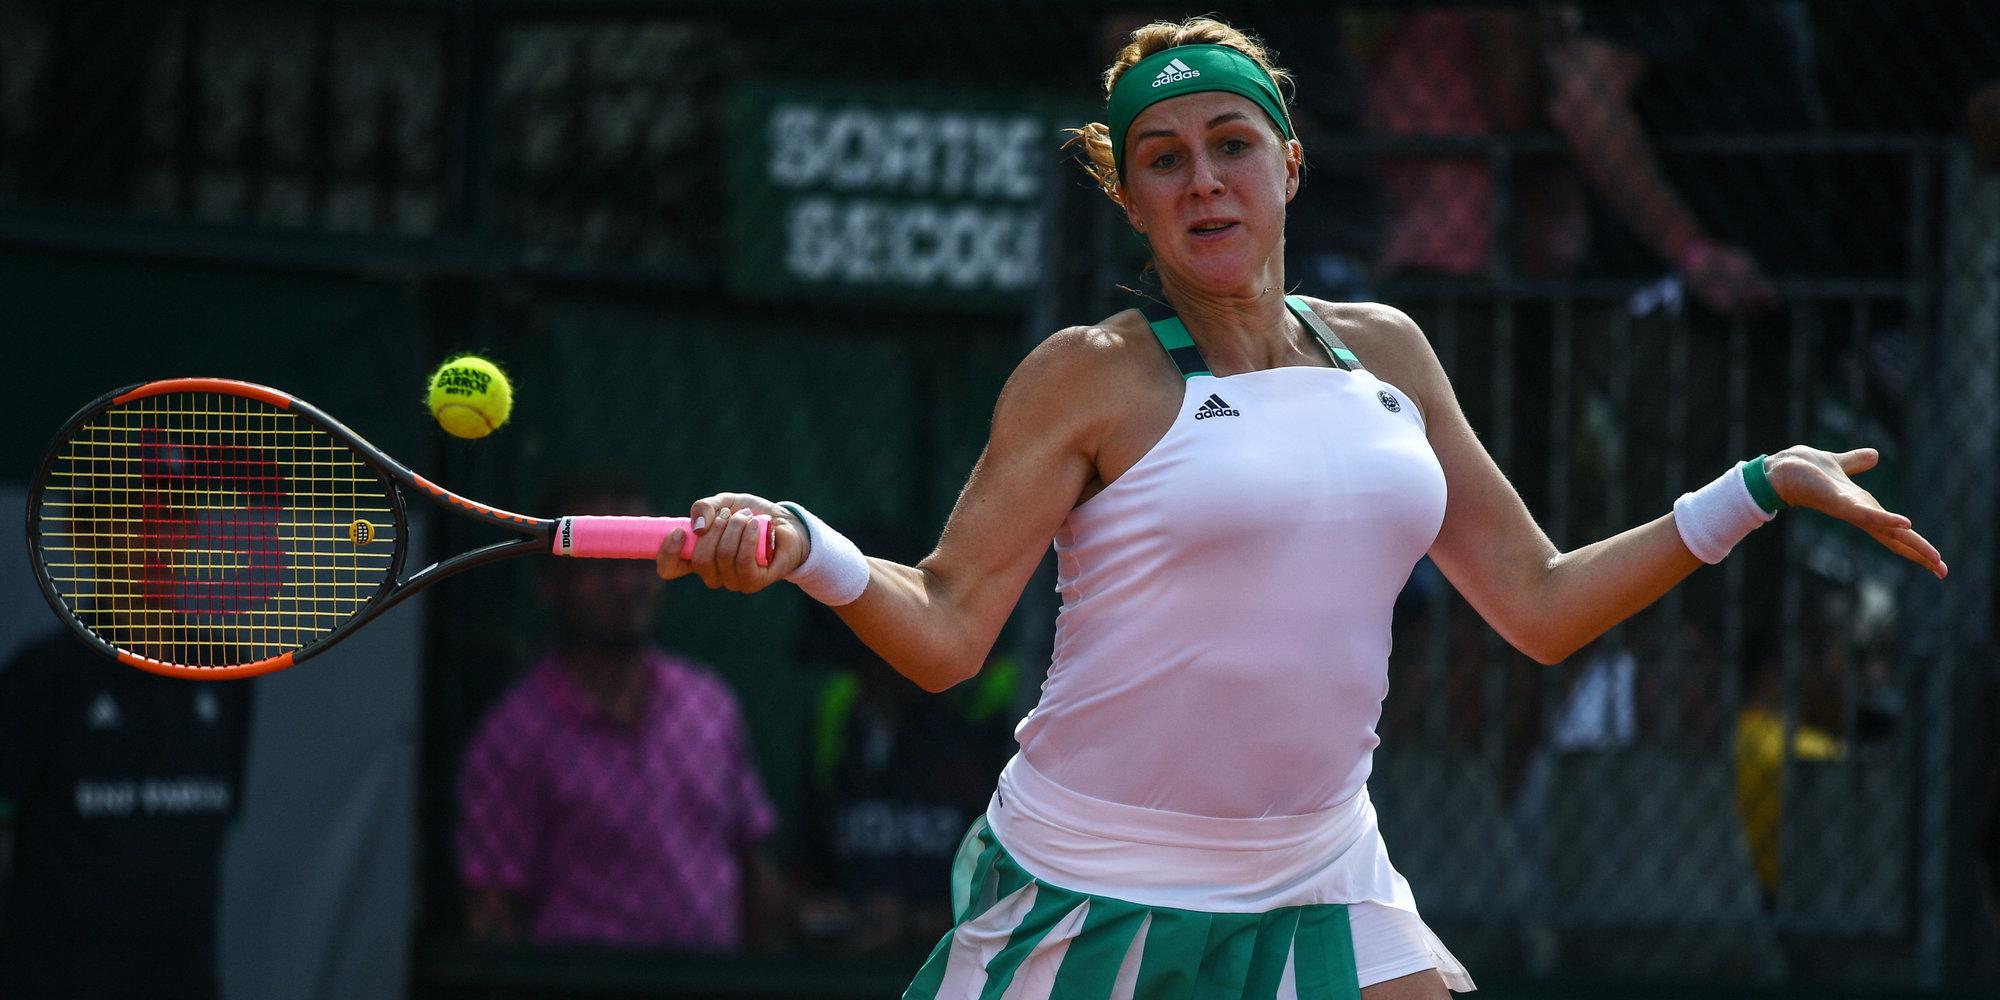 Павлюченкова пробилась во 2-ой круг теннисного турнира вШтутгарте